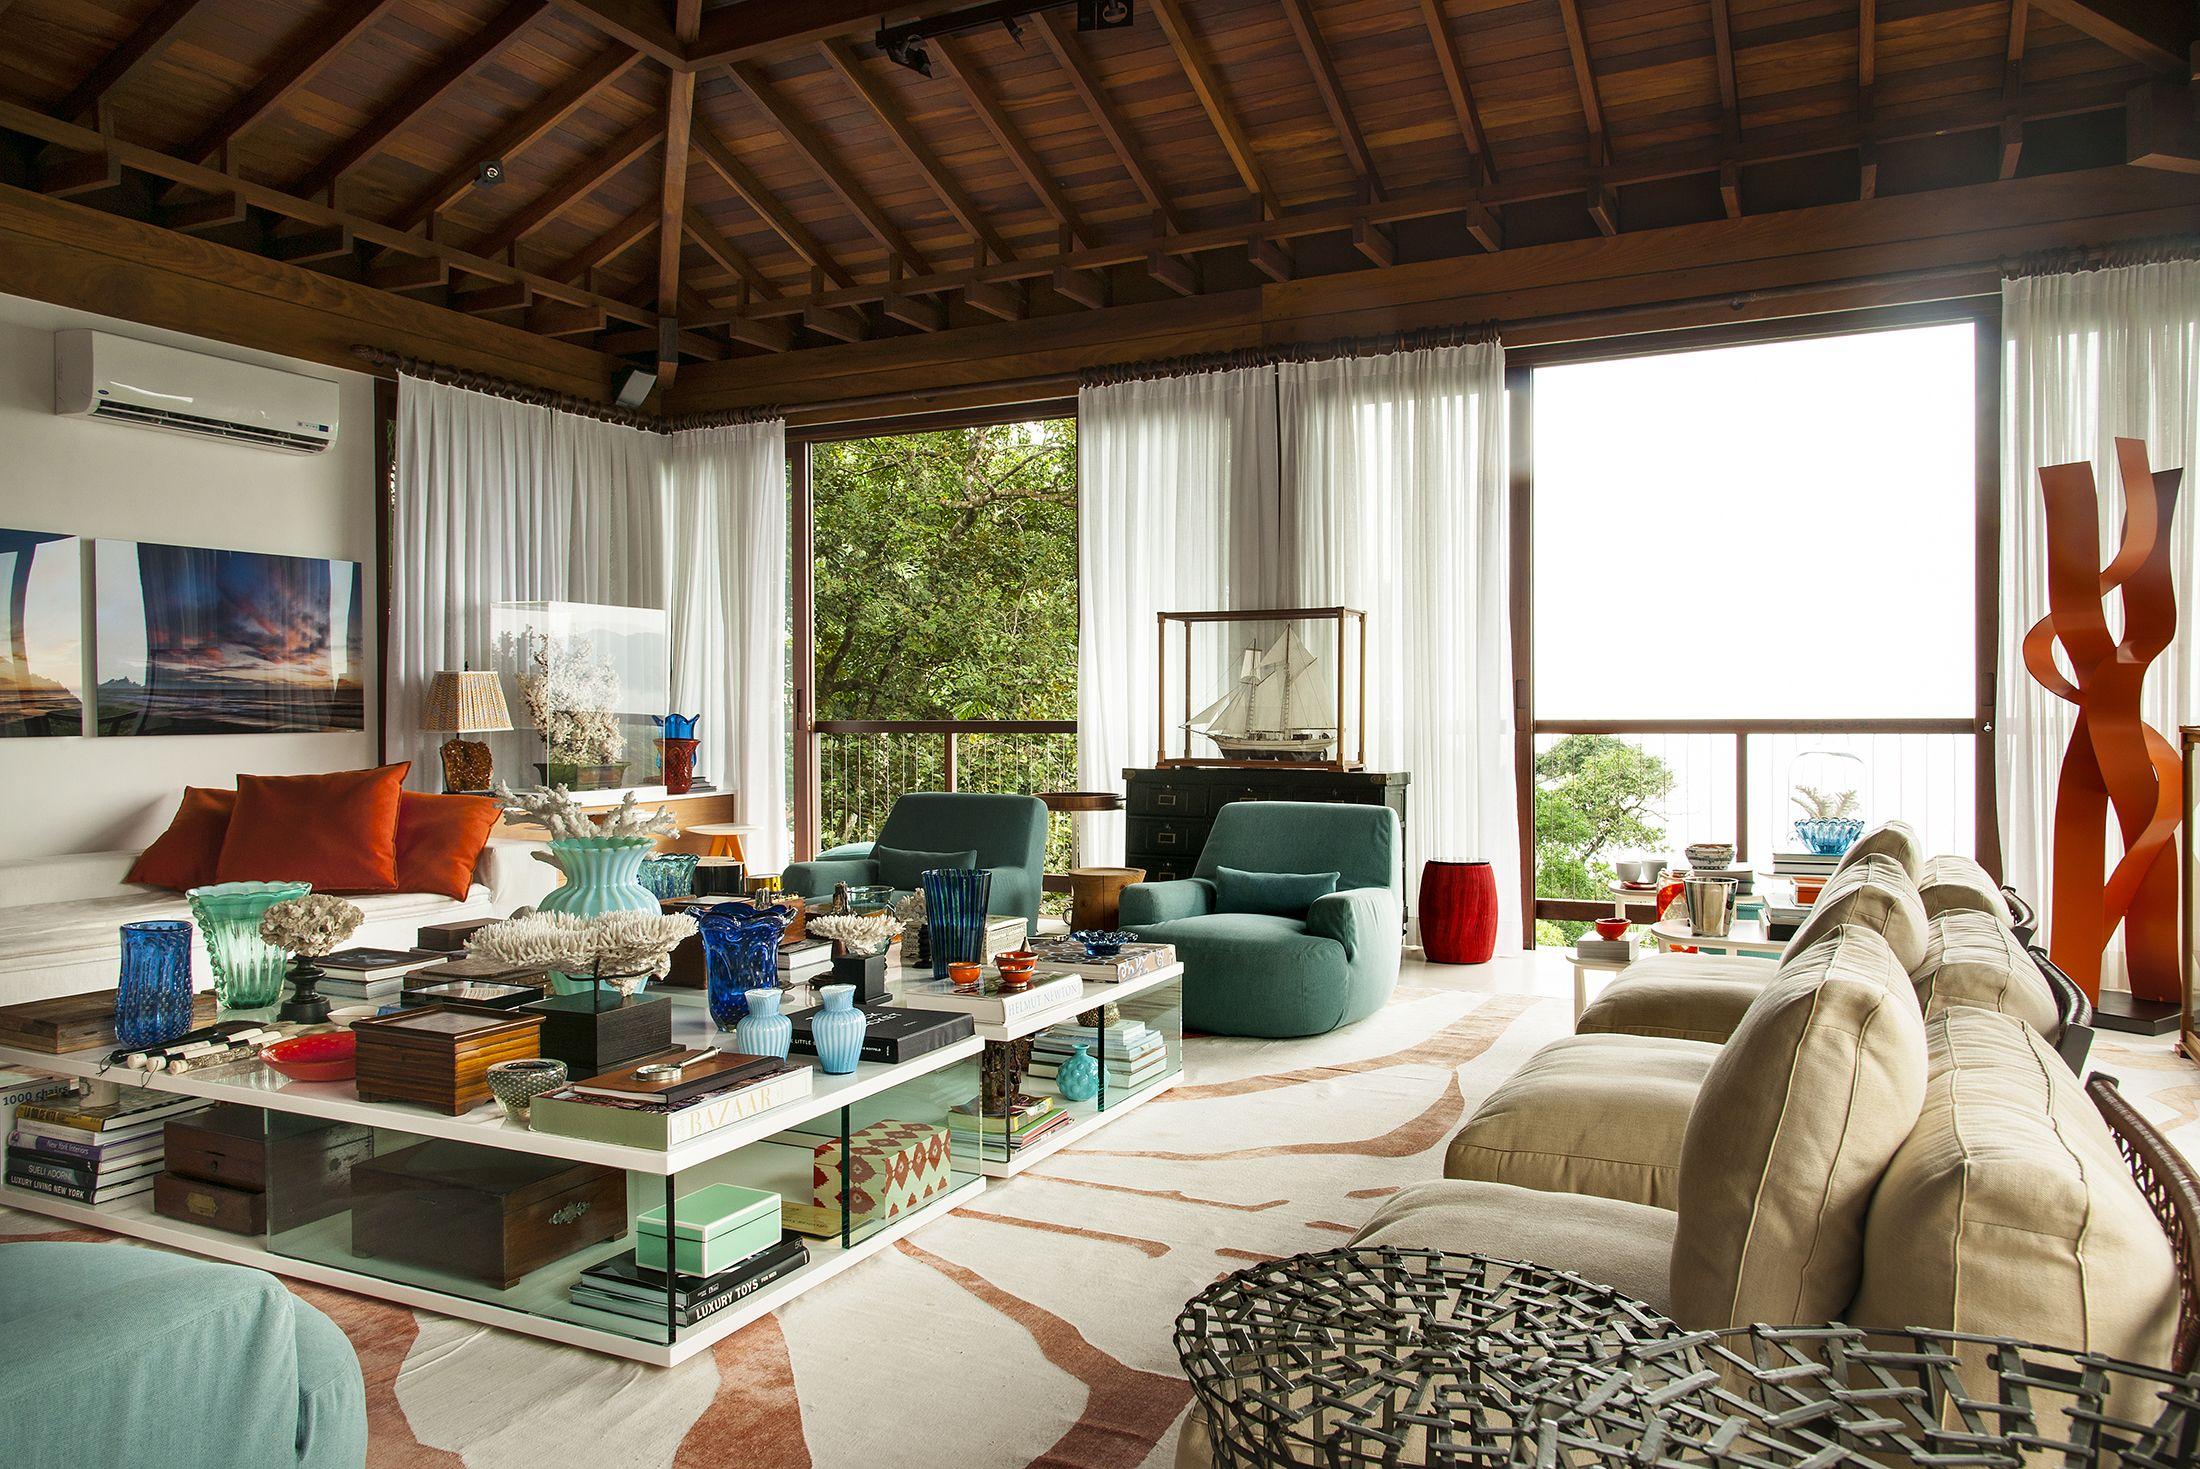 Genial Living Room Seating Ideas